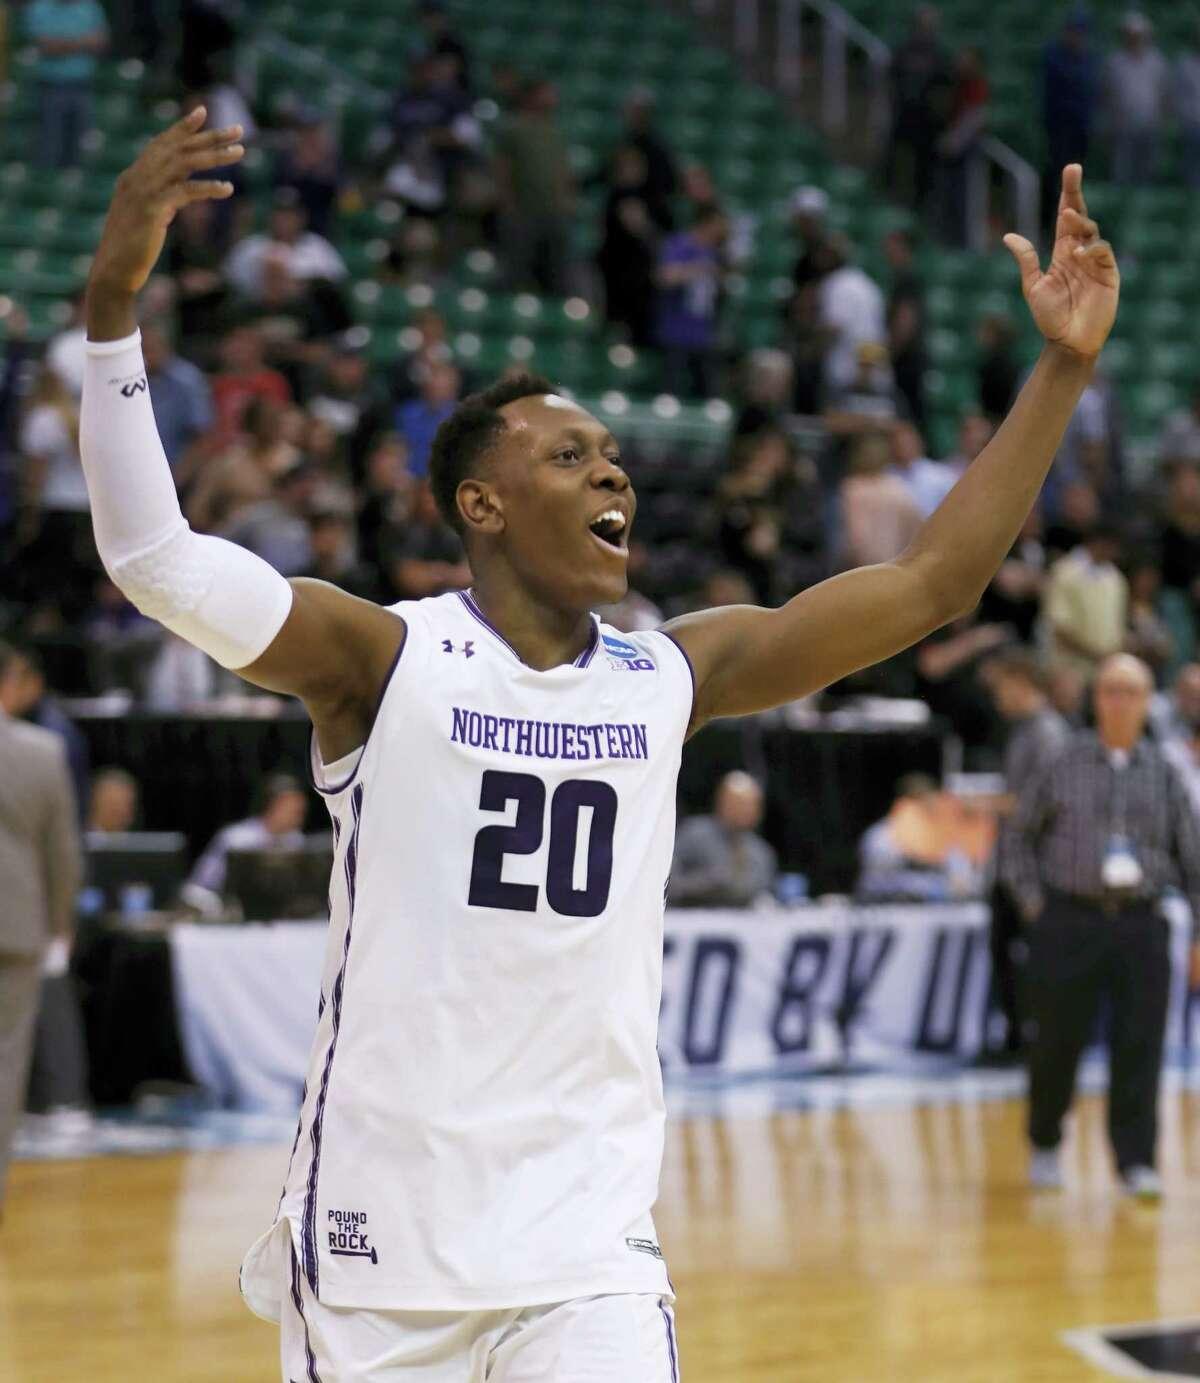 Northwestern guard Scottie Lindsey celebrates after Northwestern defeated Vanderbilt 68-66 in an NCAA Tournament first-round game Thursday in Salt Lake City.